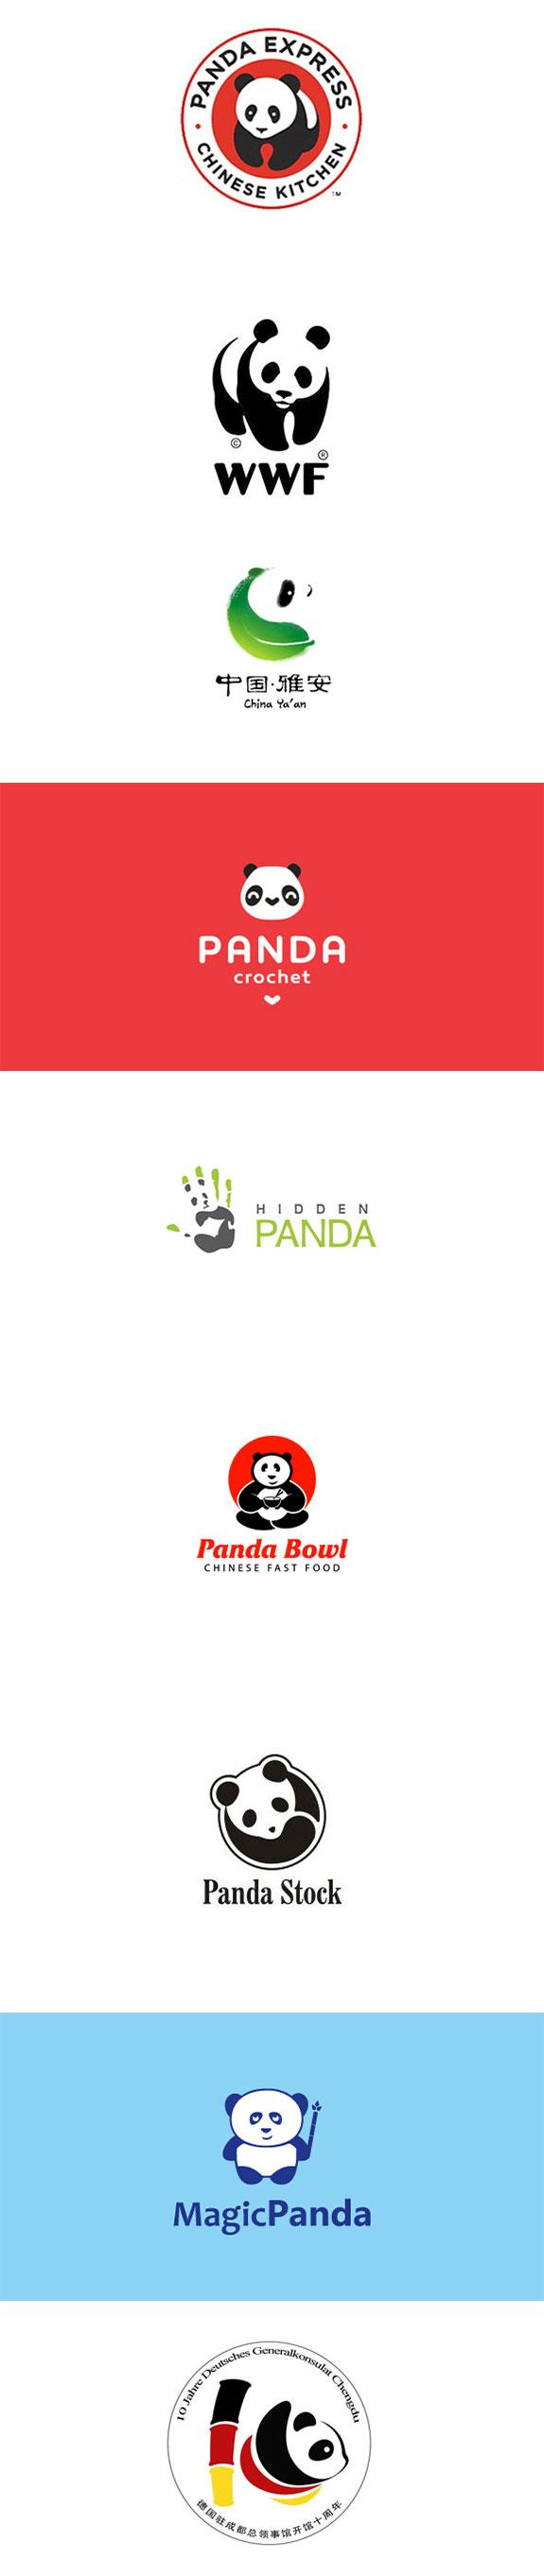 Panda element logo design 2